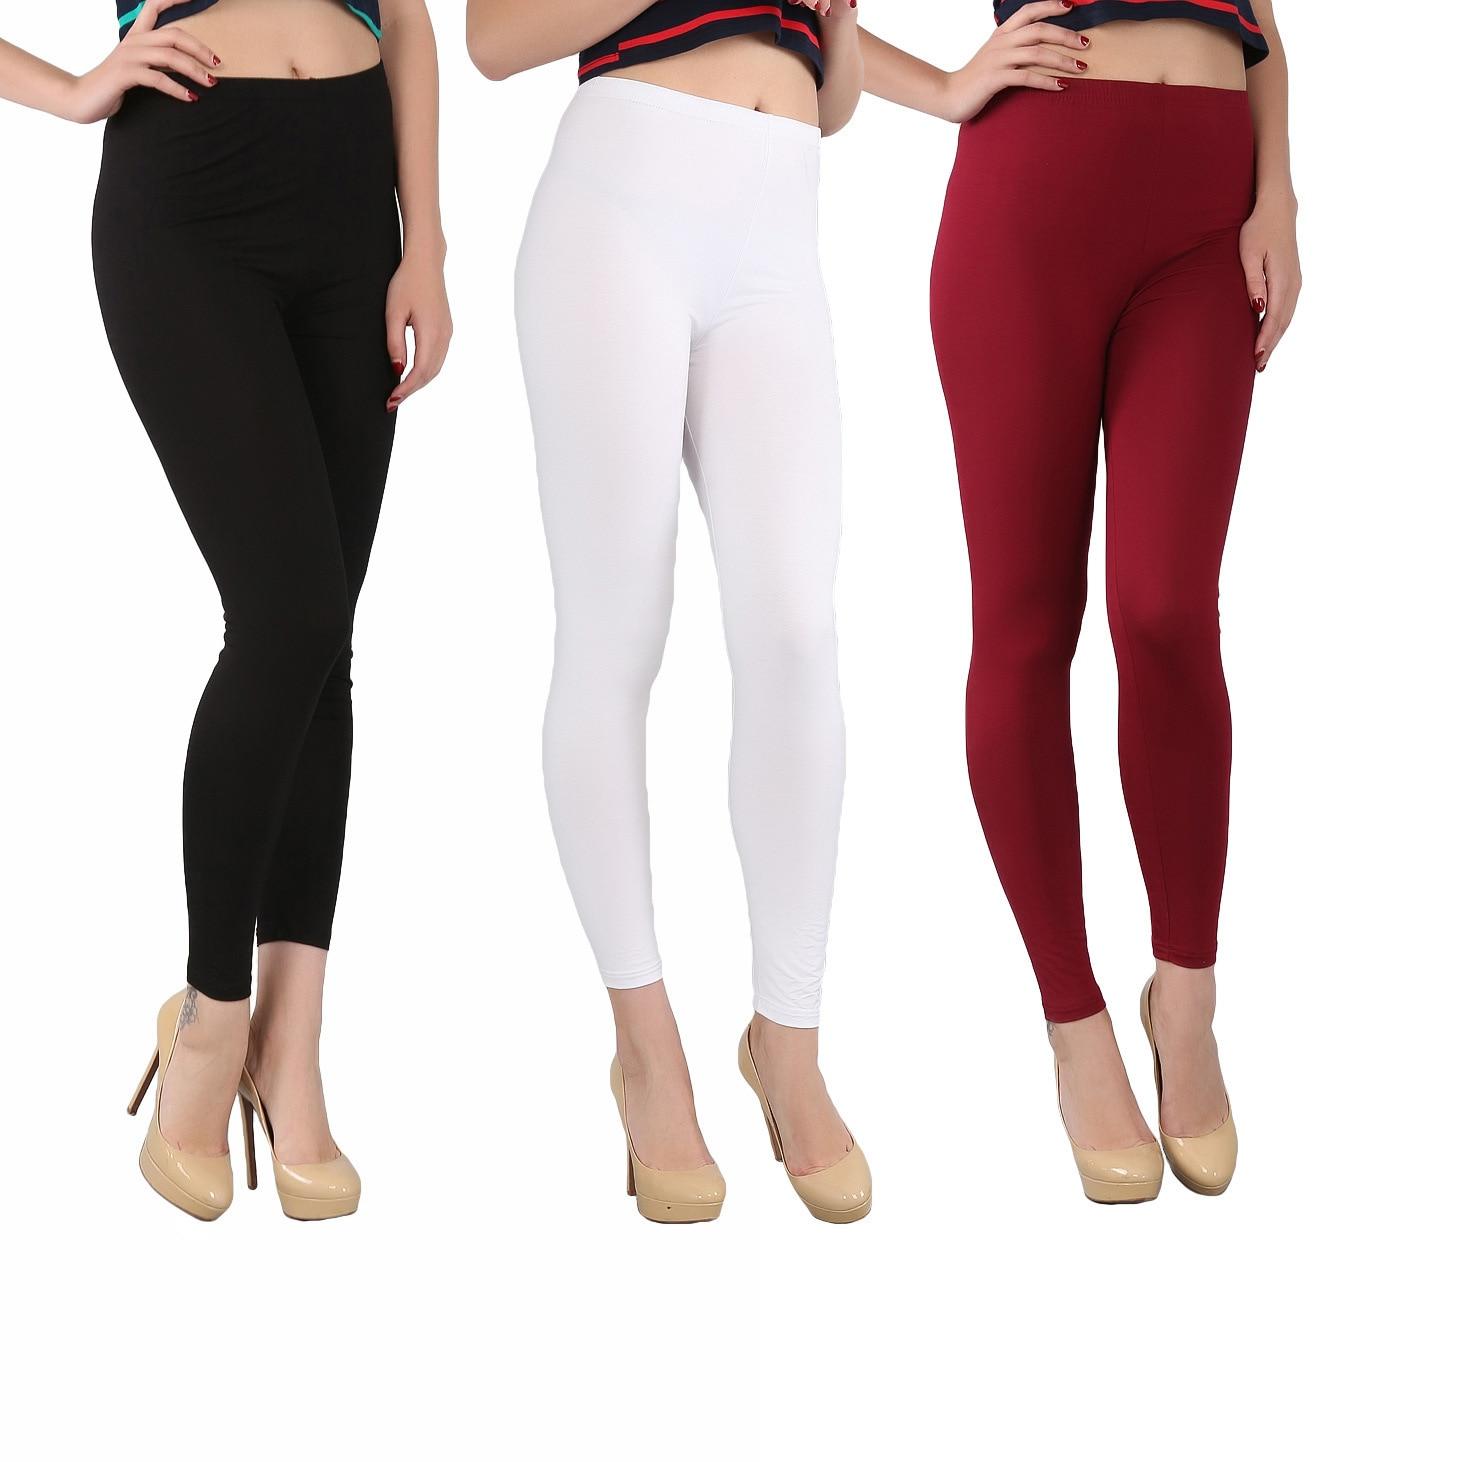 Slim Leggings Bamboo-Fiber 7XL High-Elastic Autumn Women Plus-Size Summer Fashion And